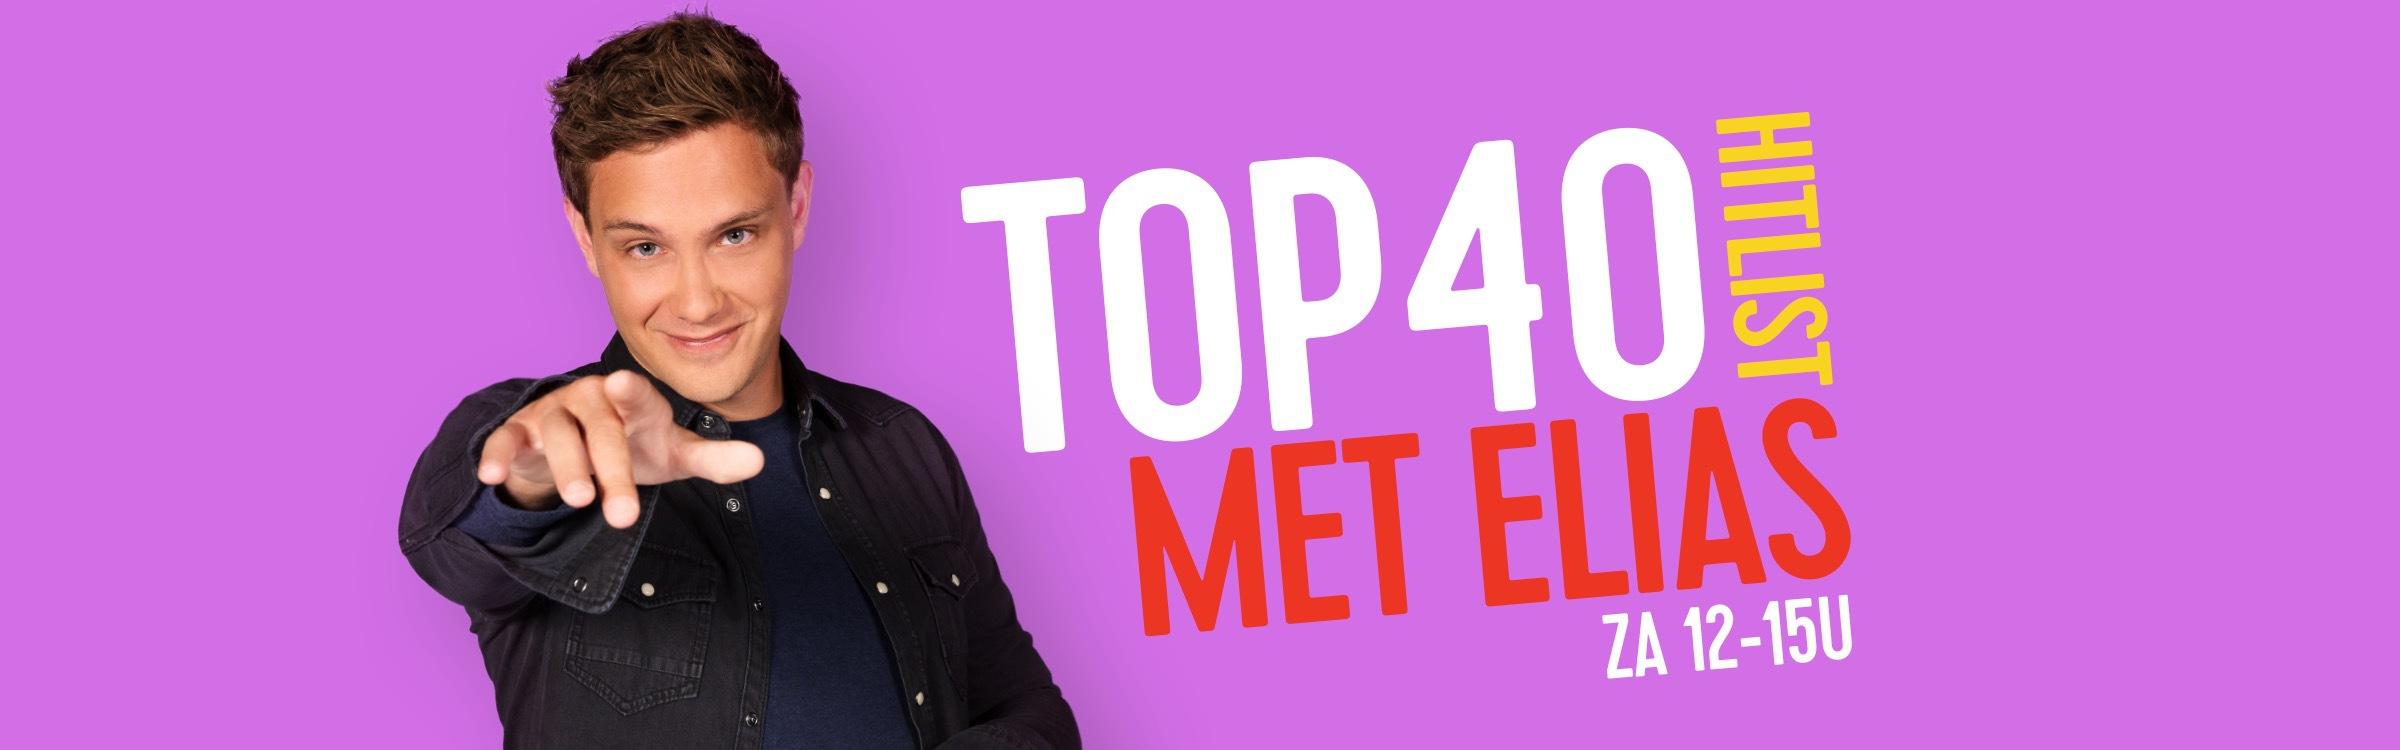 Top 40 hitlist met elias